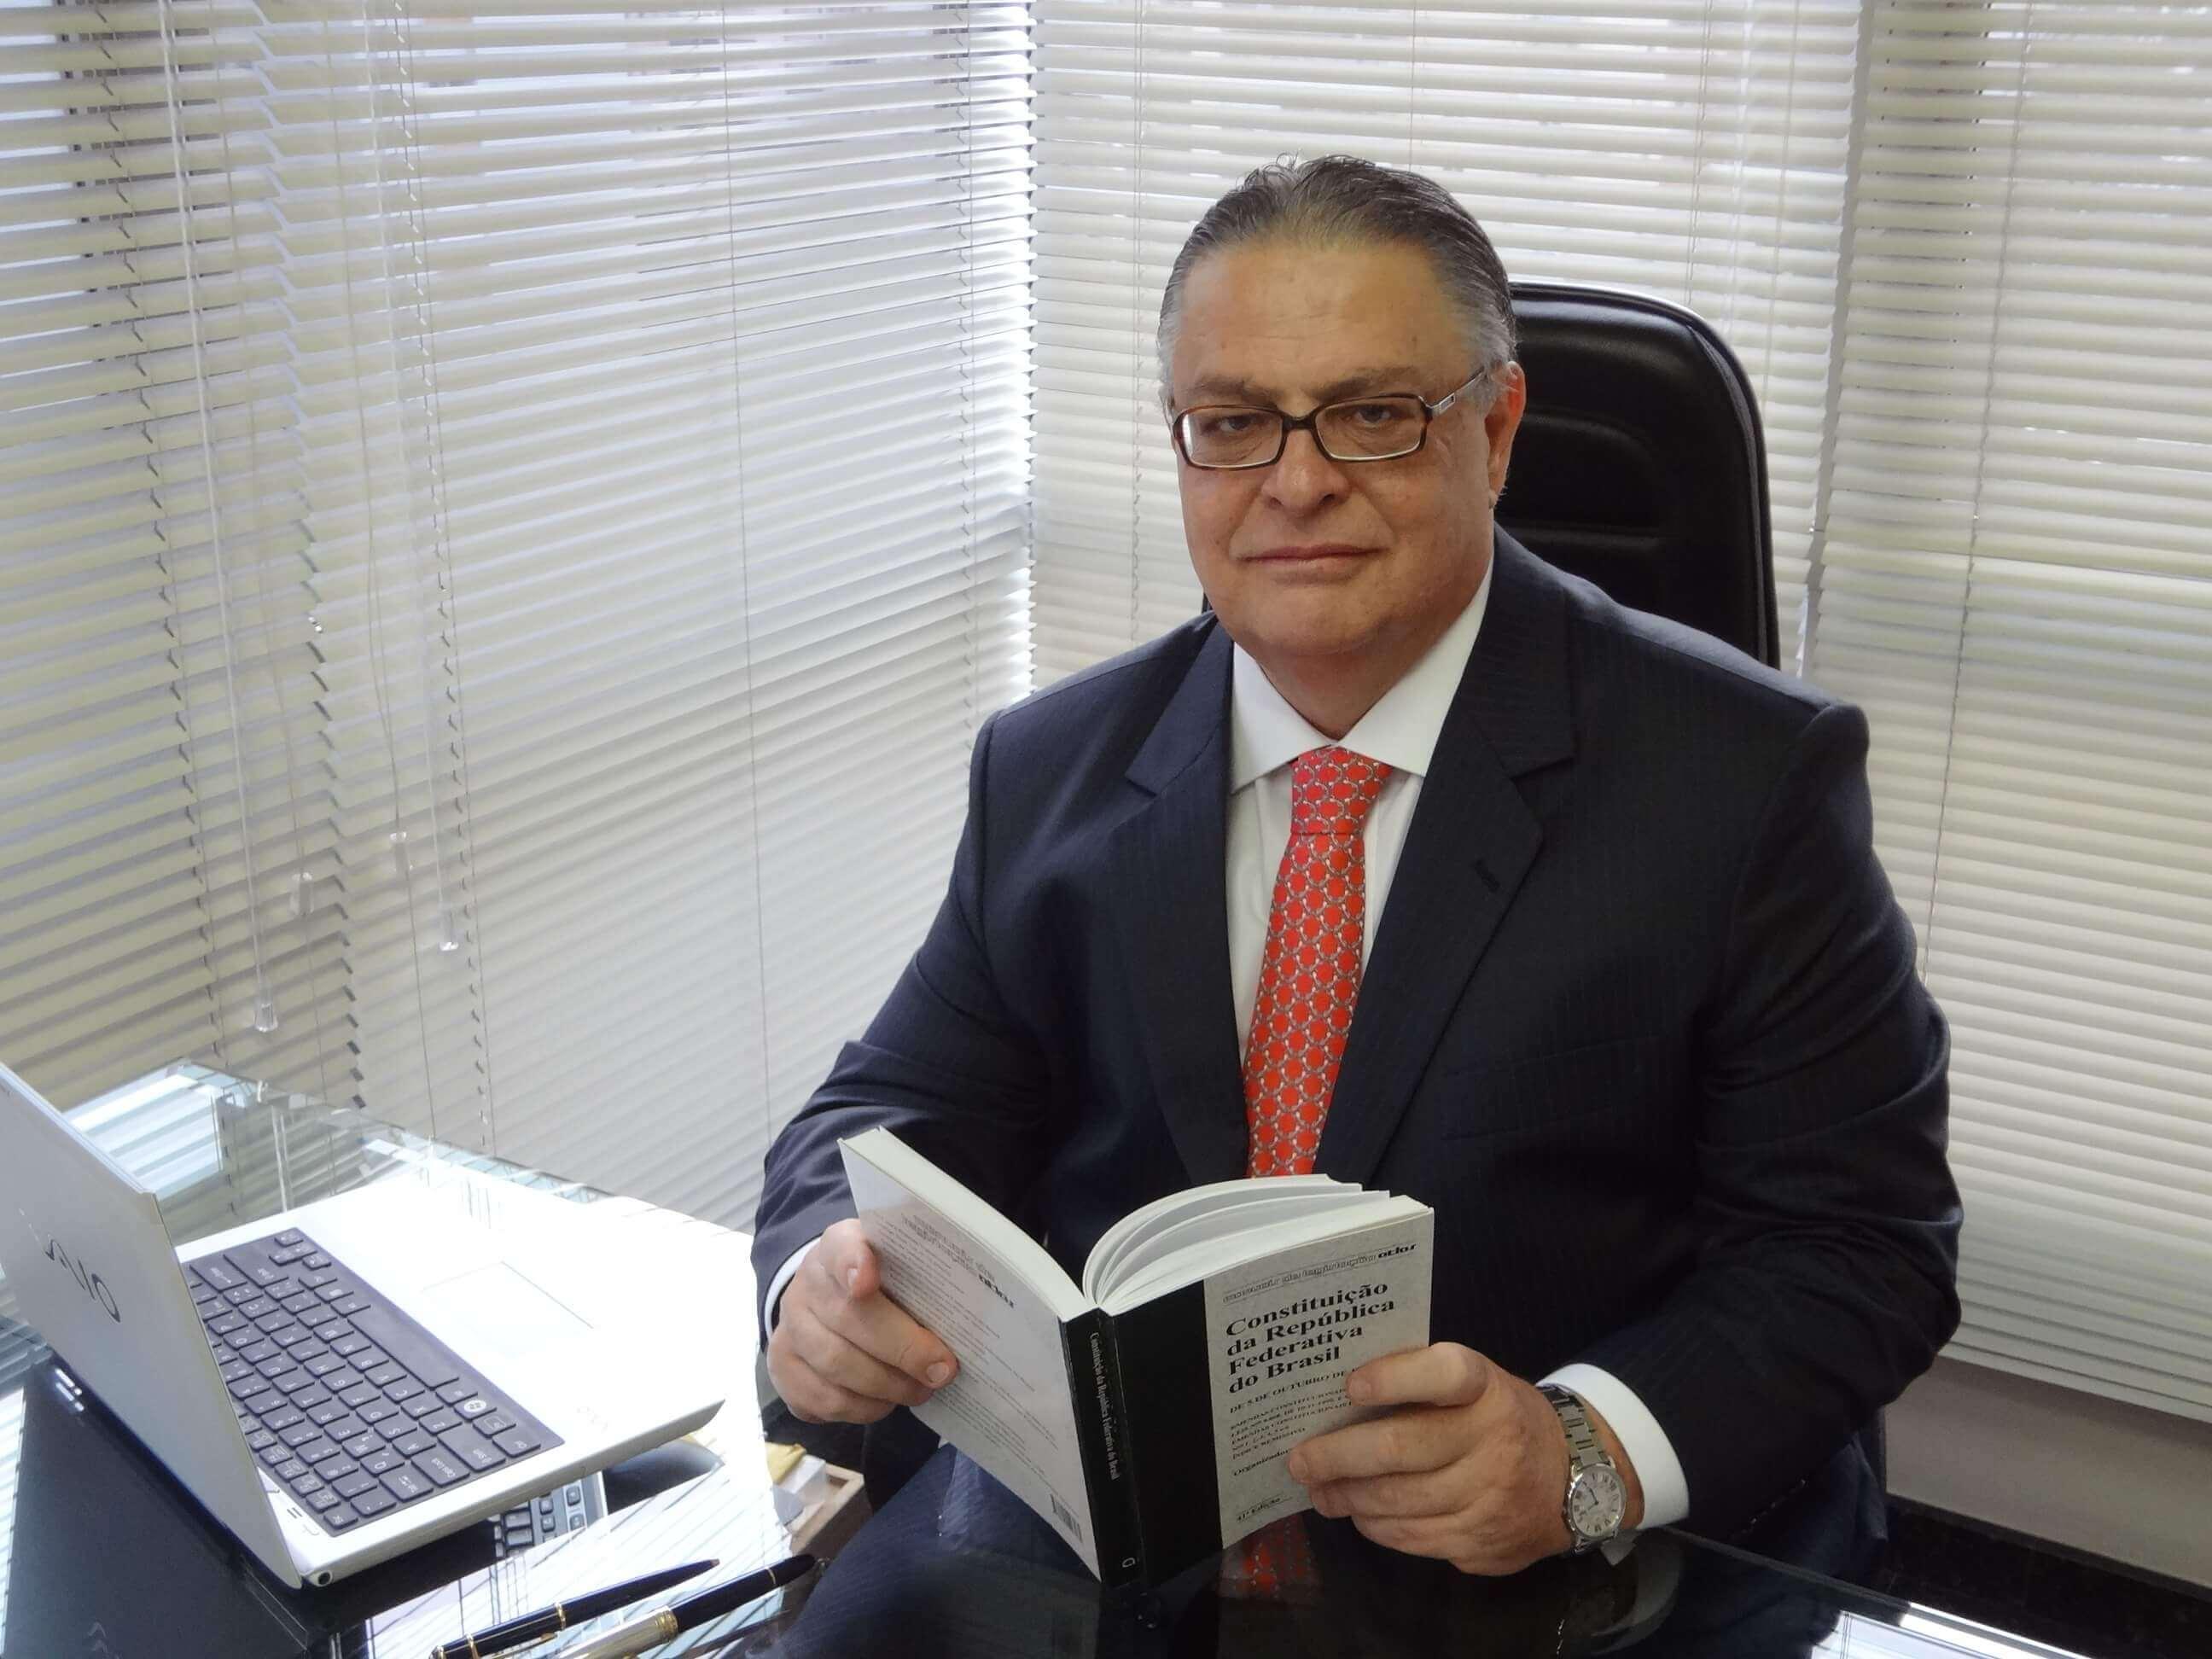 Luiz Silvio Salata